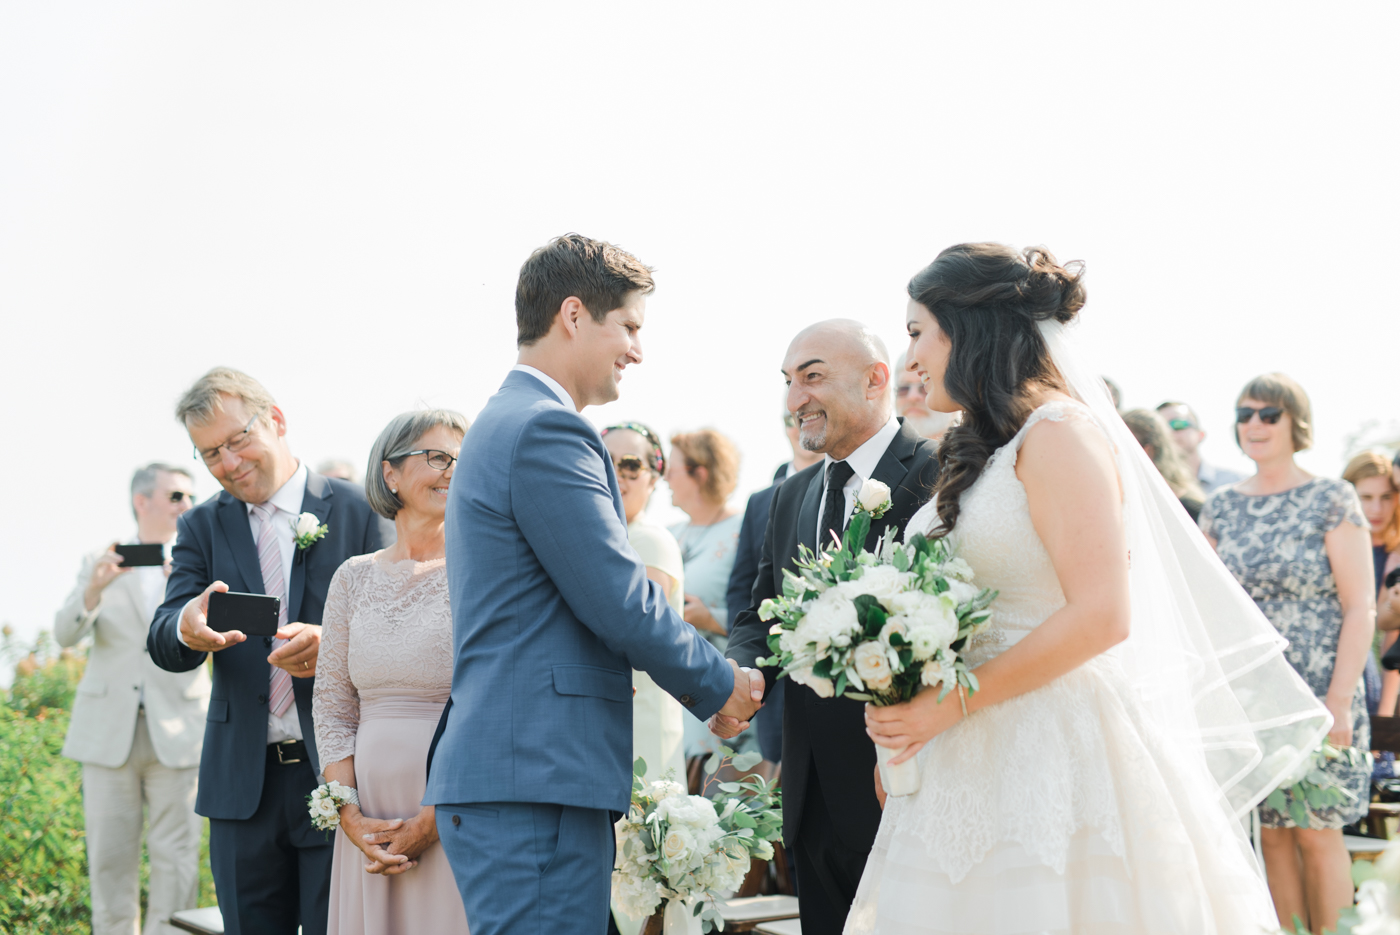 AKP_S&F_Malibu_Wedding_Fine_Art_Photography_Los_Angeles-16_ceremony.jpg